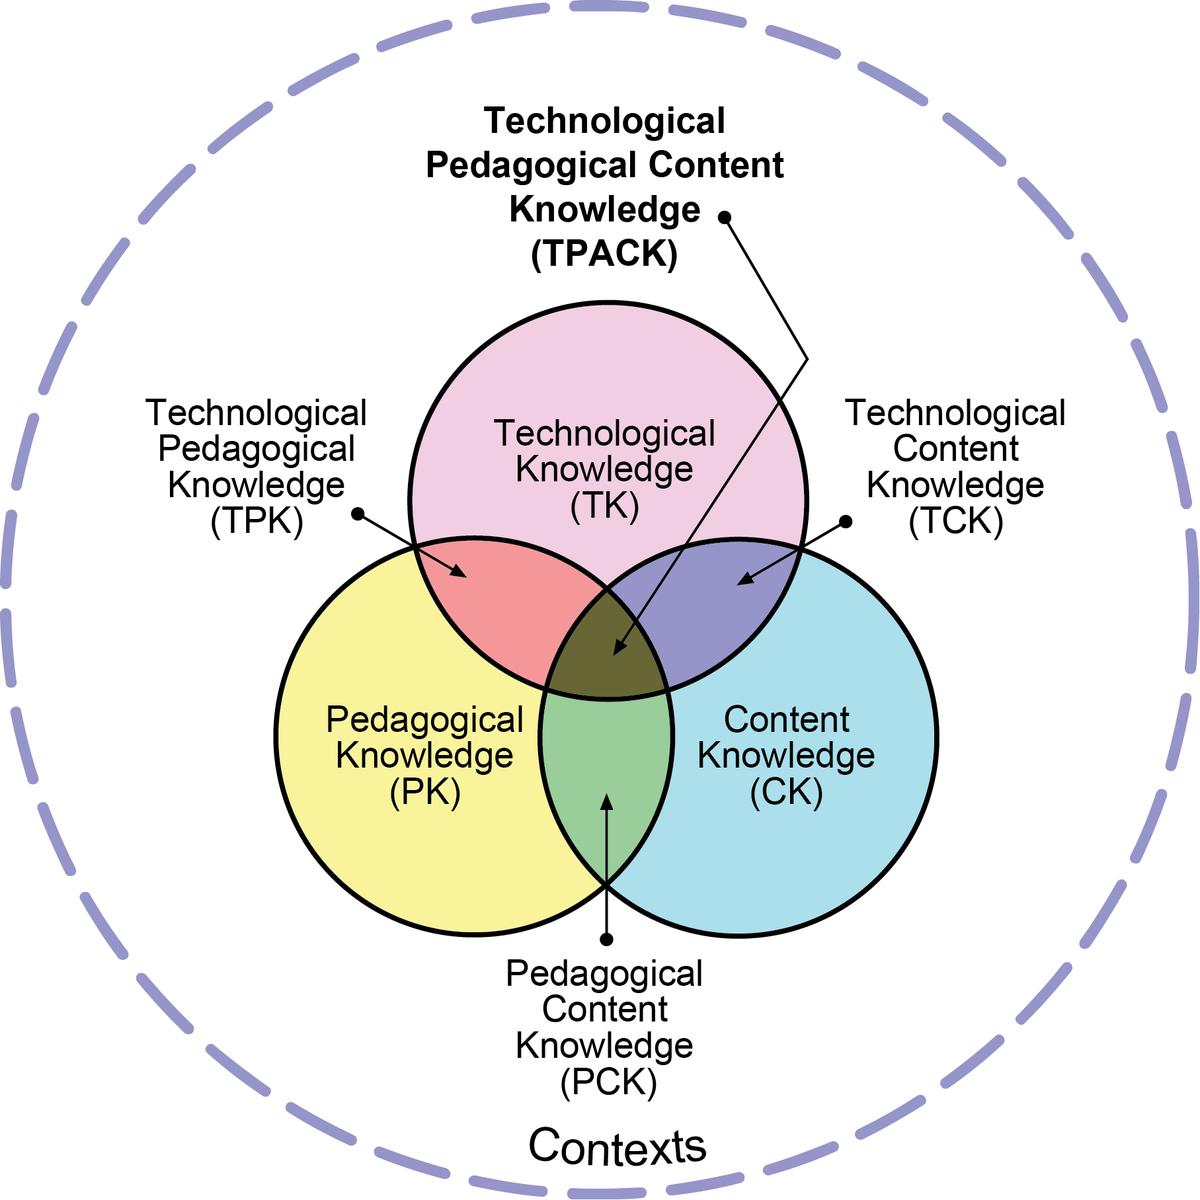 Technological pedagogical content knowledge - WikipediaWikipedia